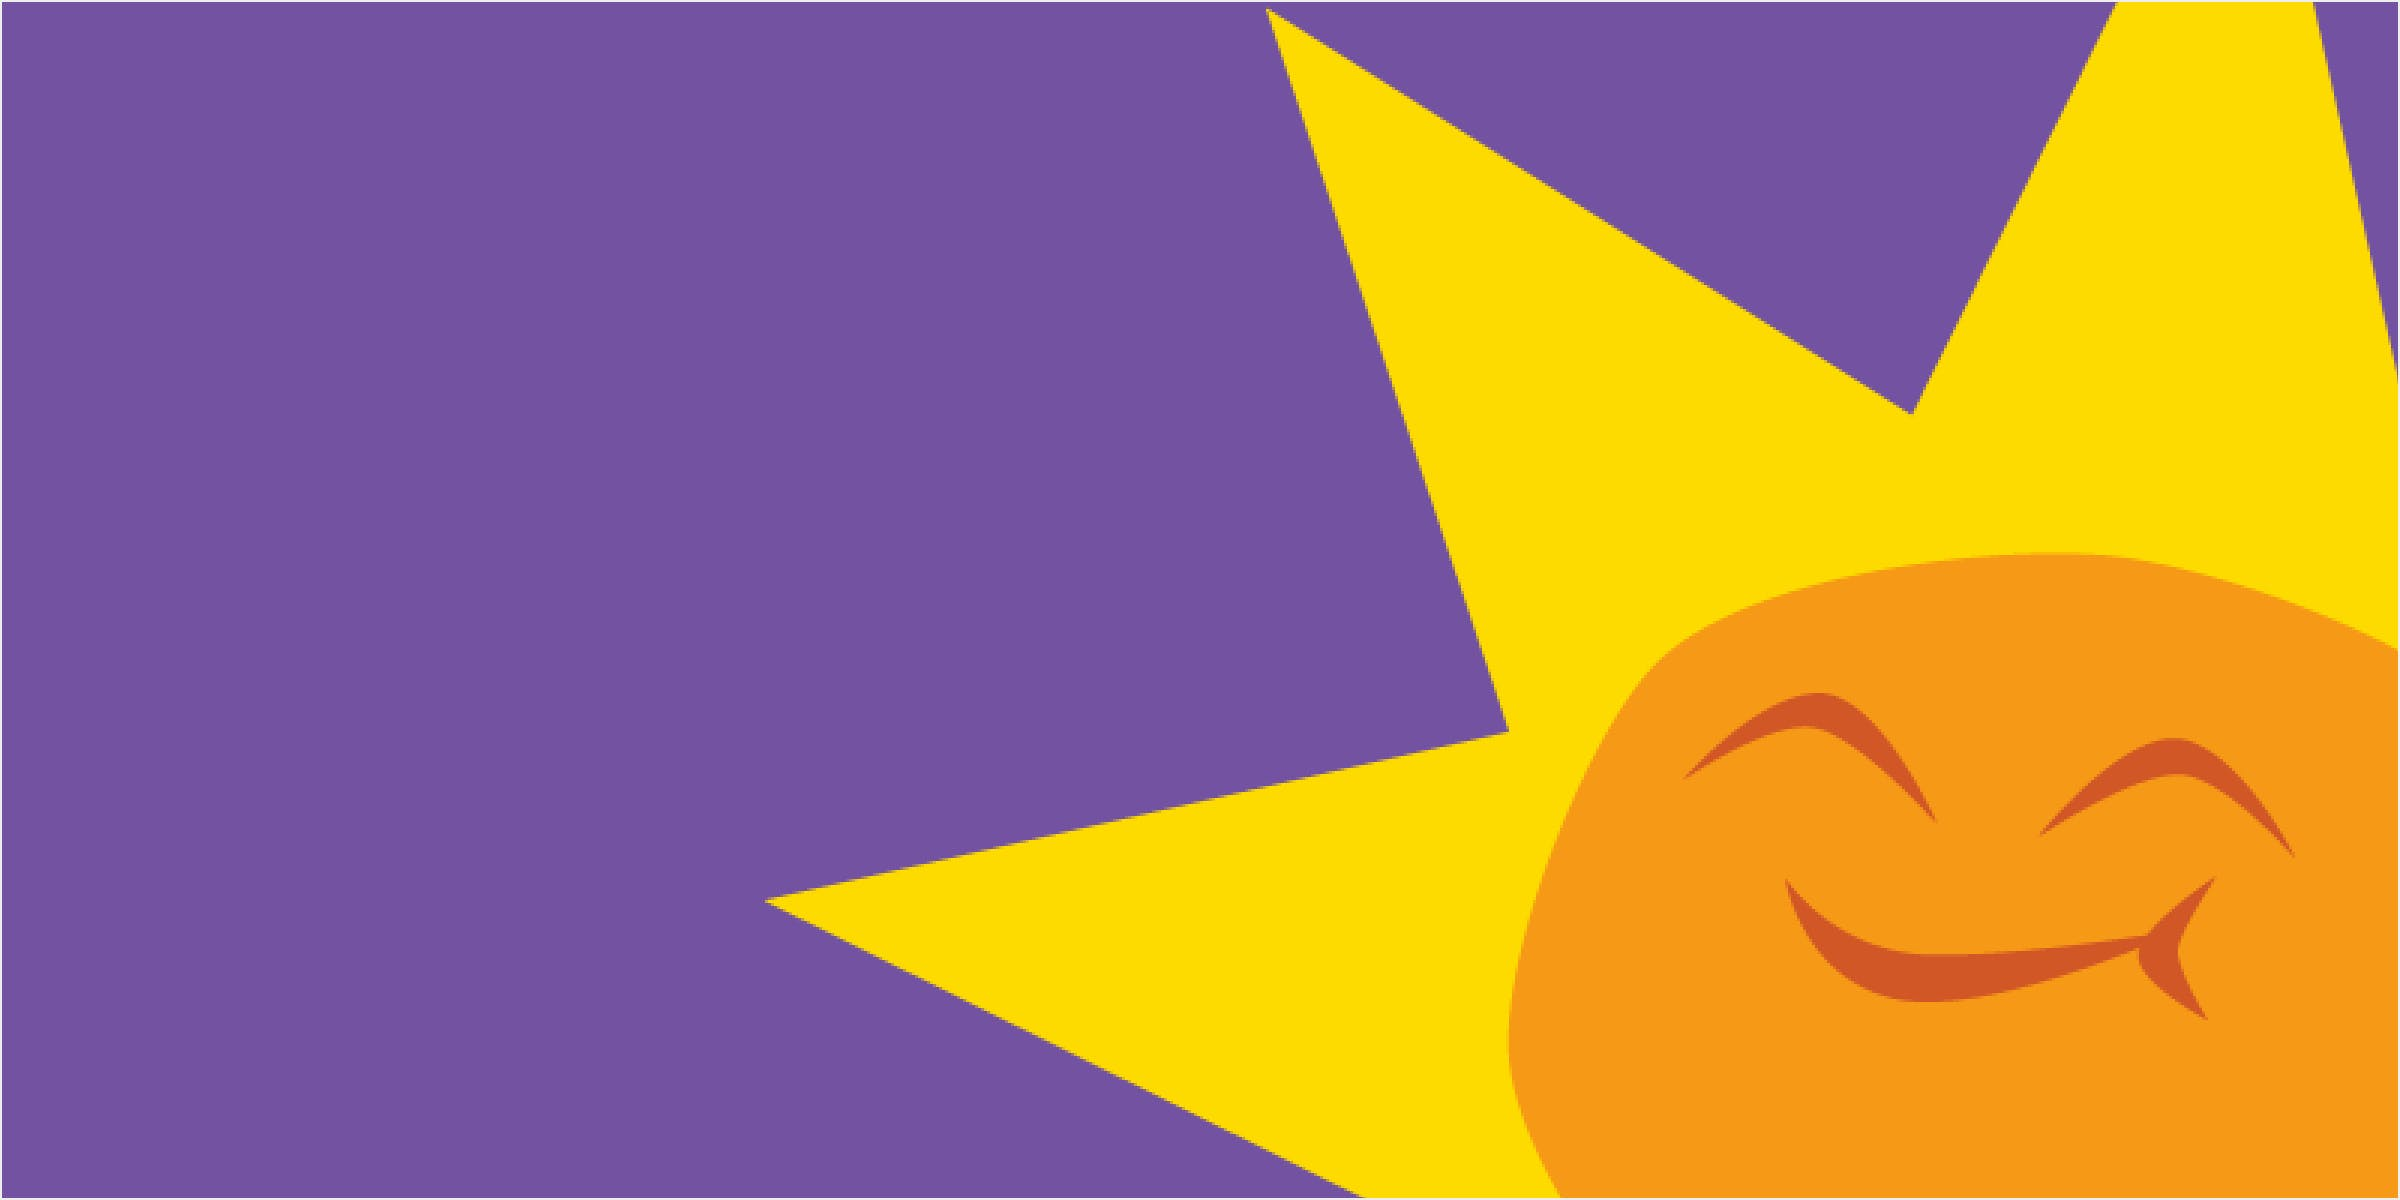 A smiling sun